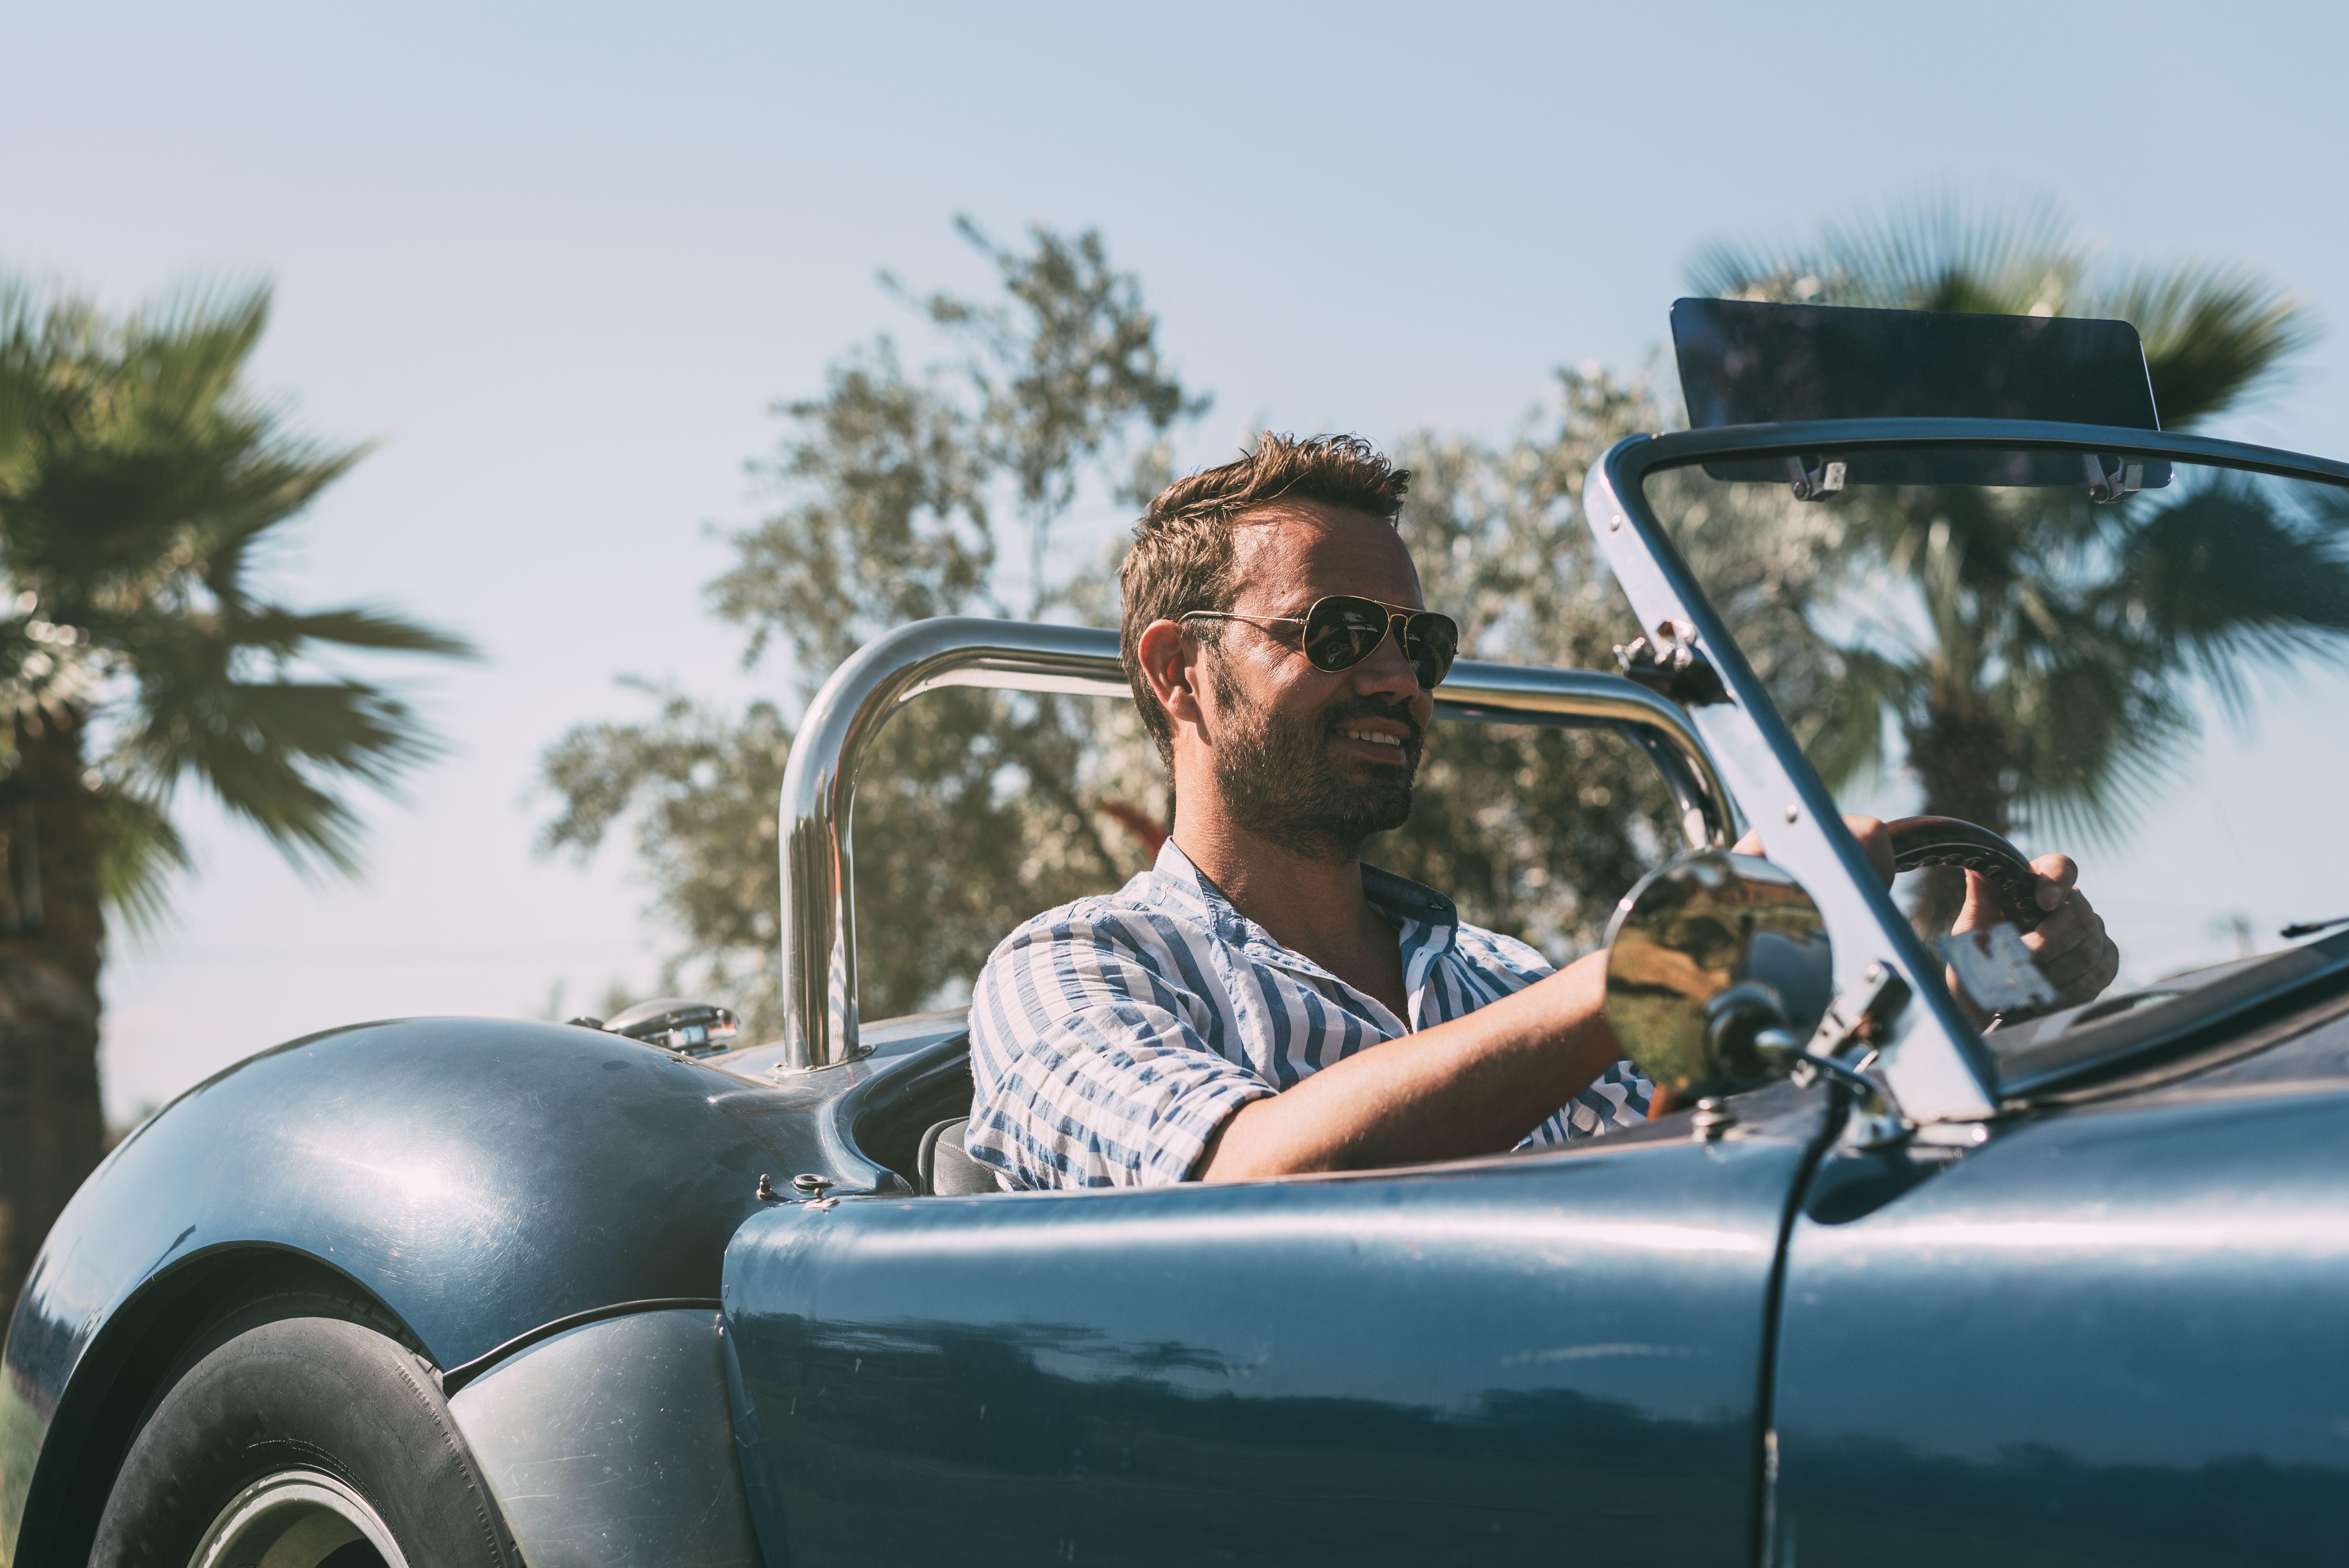 A man driving a convertible car